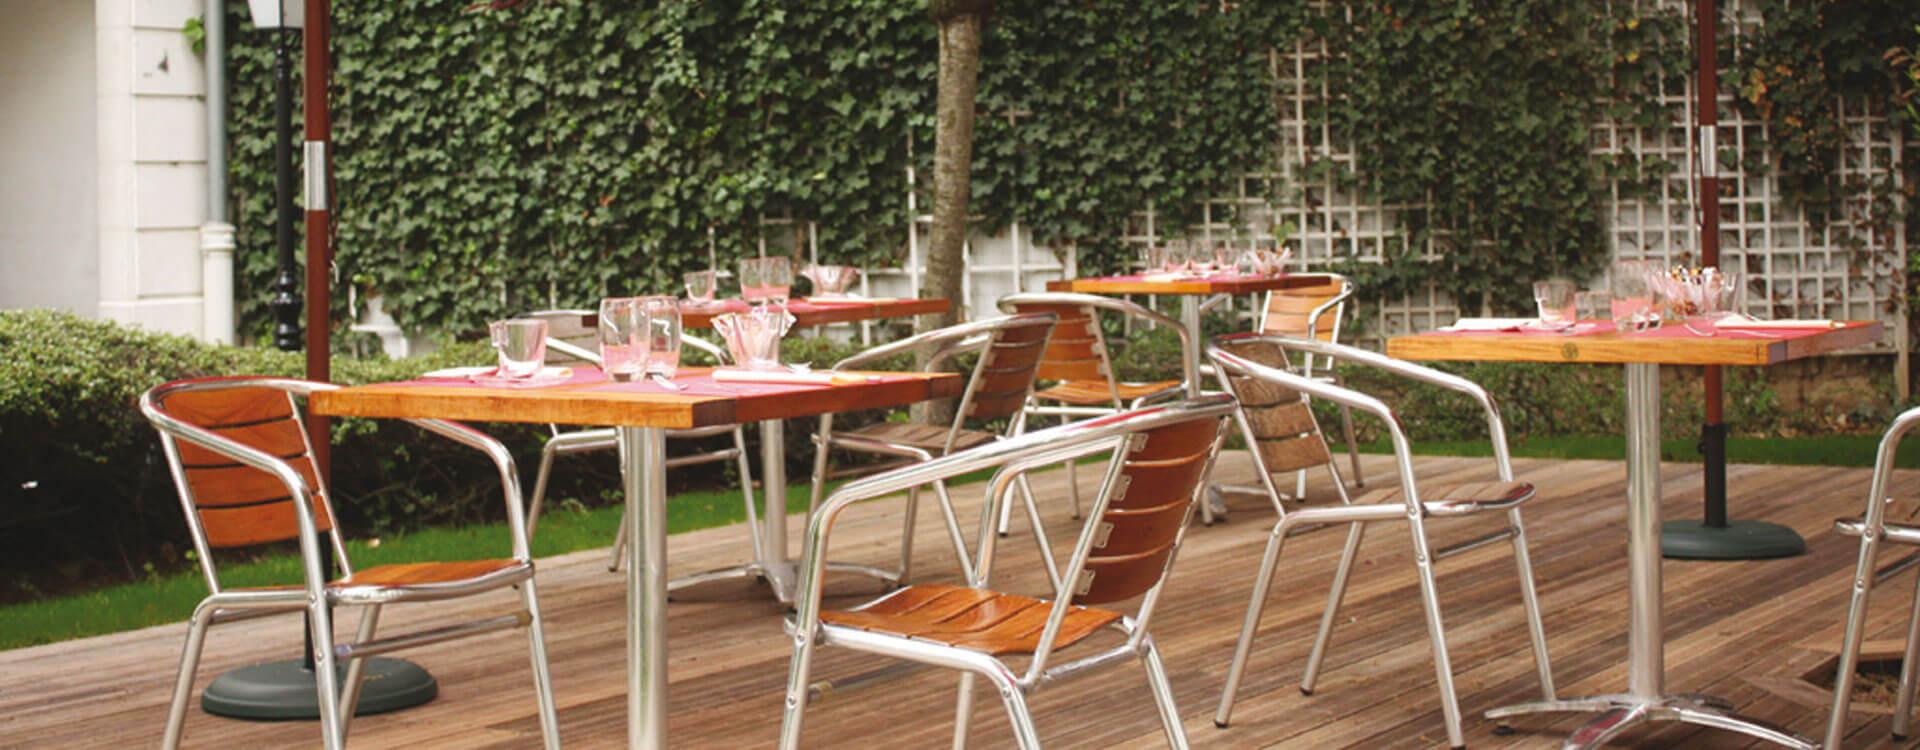 Terrasse - Hôtel*** Paris La Villa Modigliani